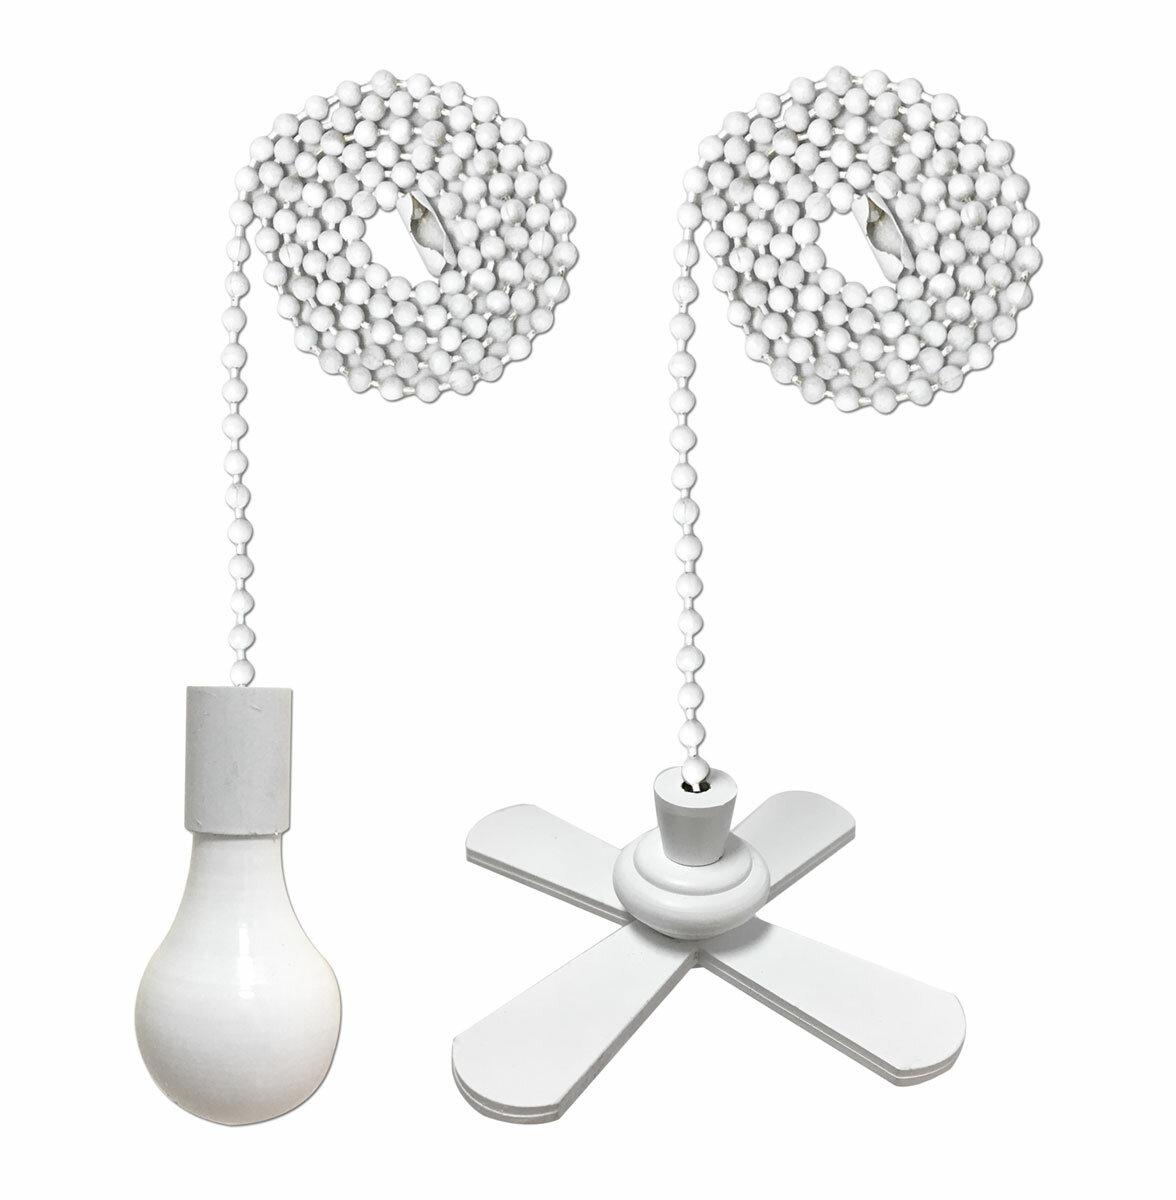 Royaldesigns 2 Piece Fan And Light Bulb Shaped Ceiling Fan Pull Chain Set Reviews Wayfair Ca